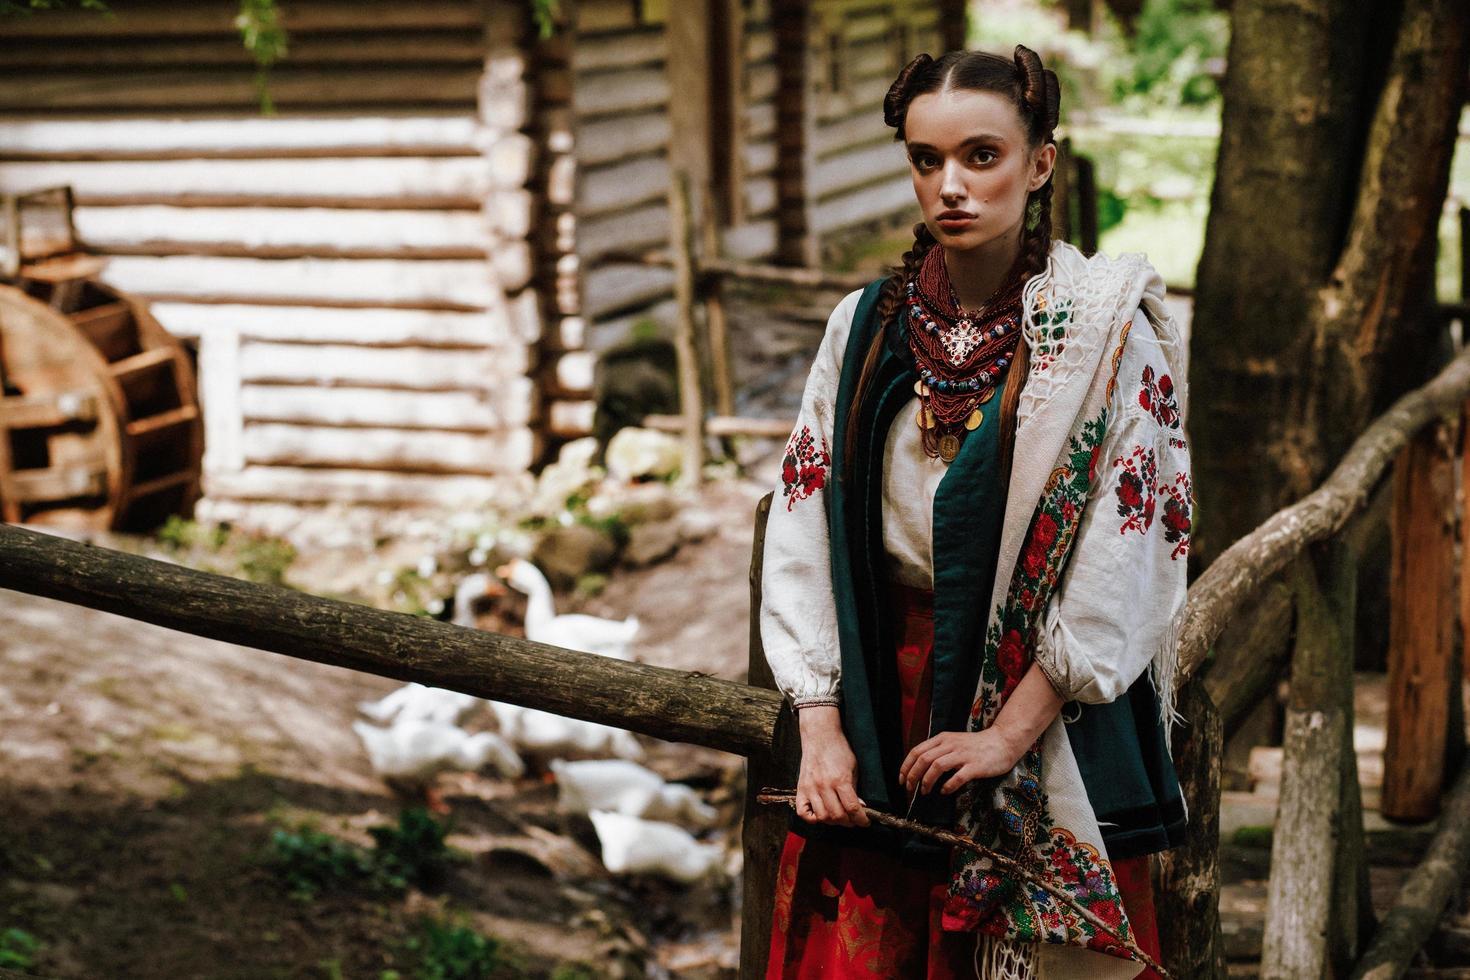 Oekraïens meisje in een geborduurde jurk foto